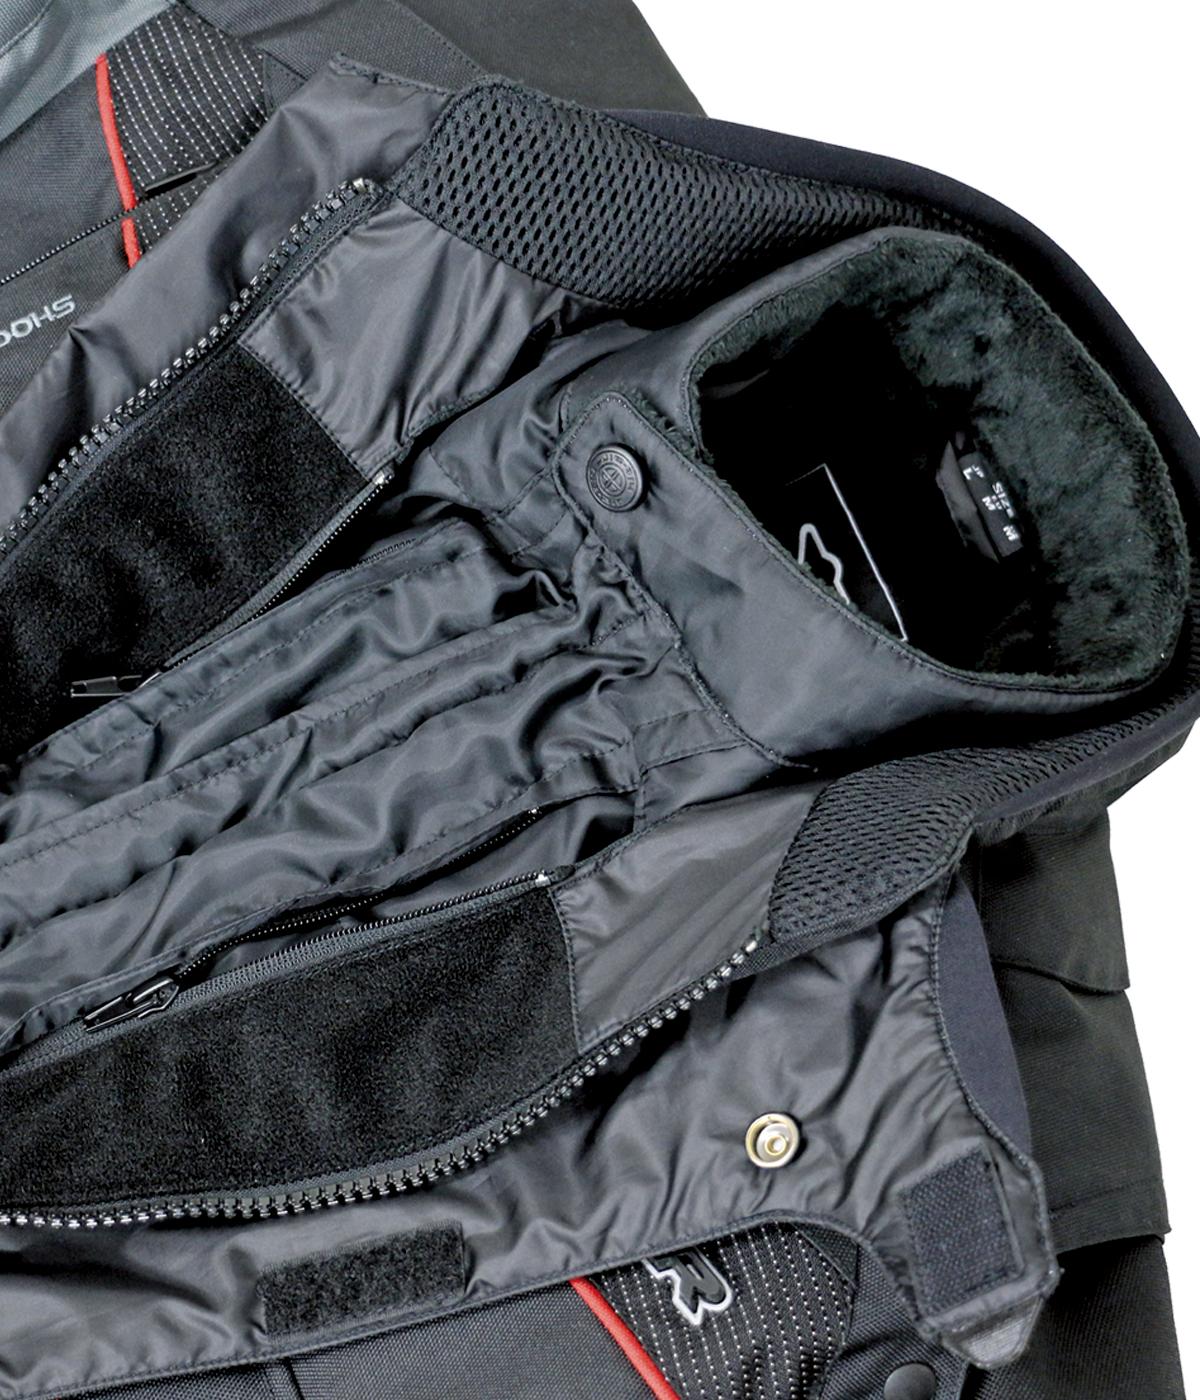 Liner zipper